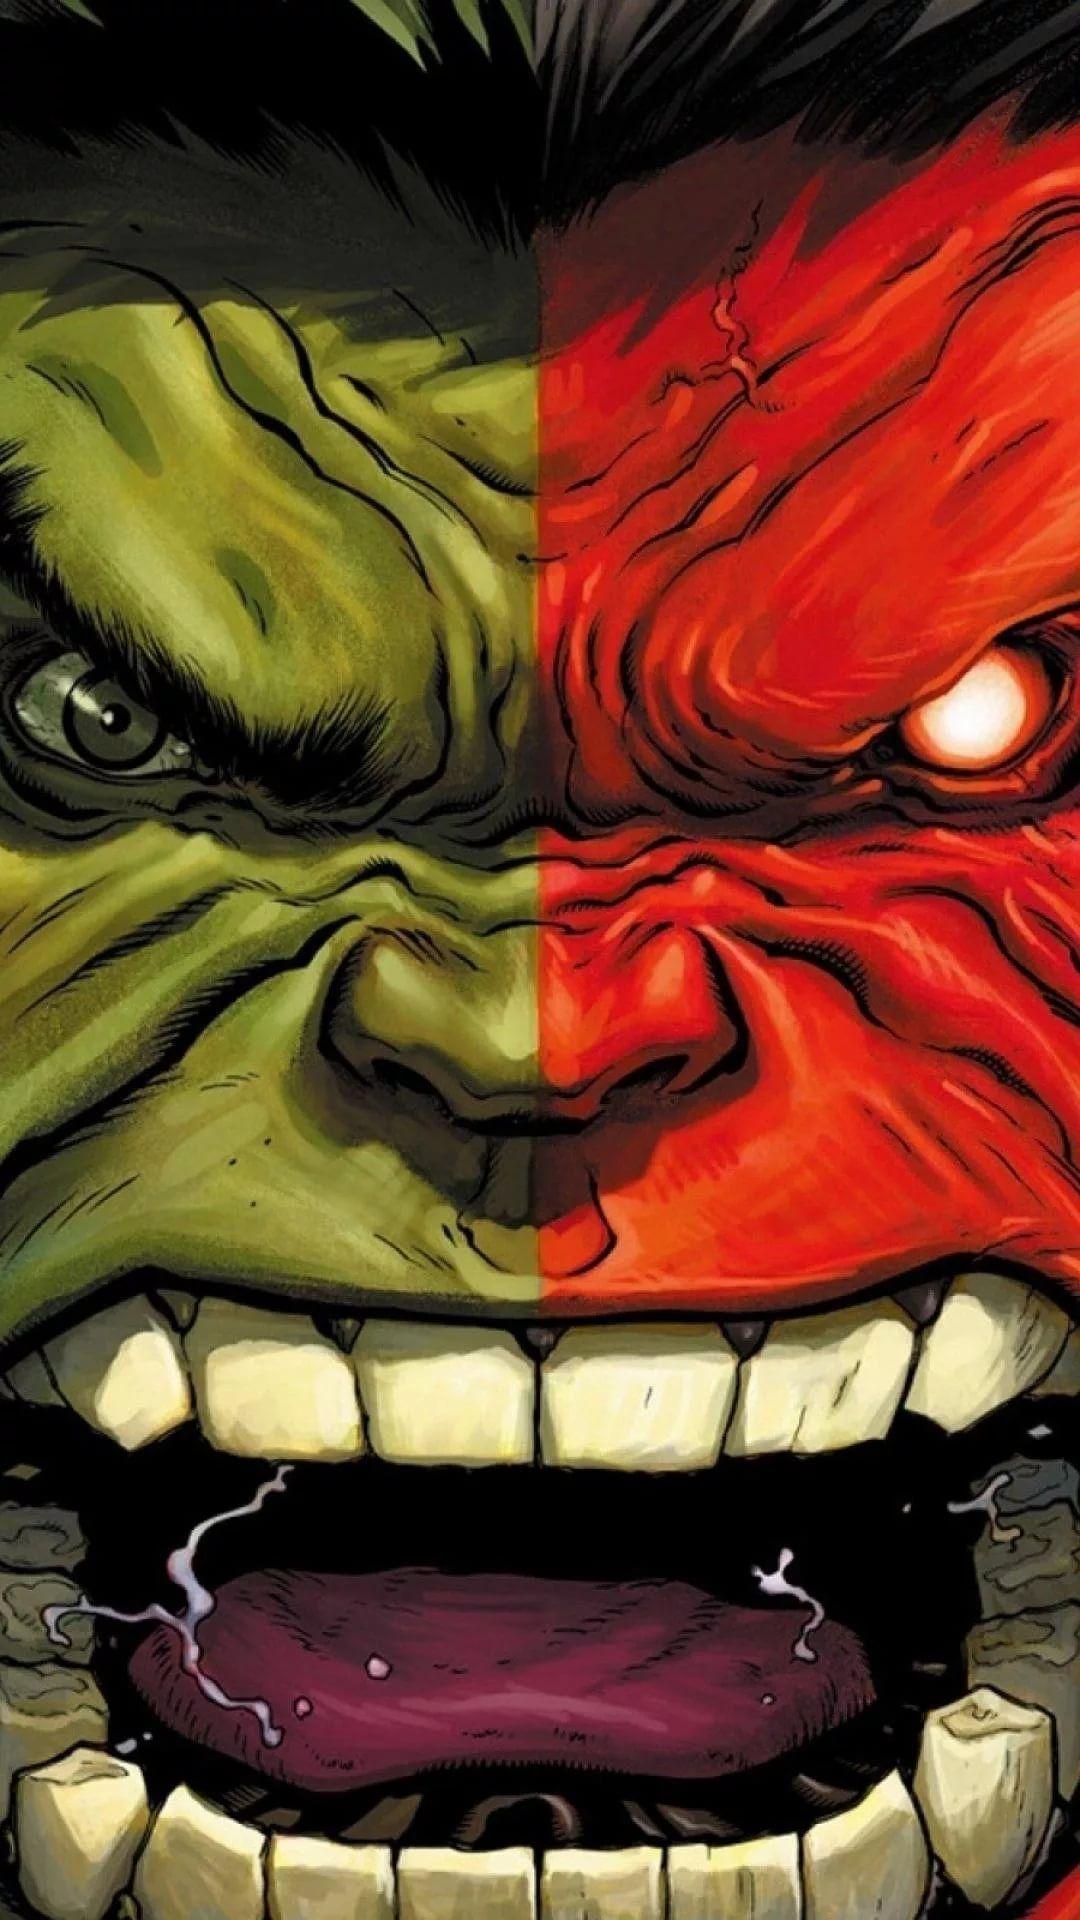 Hulk D wallpaper for your phone